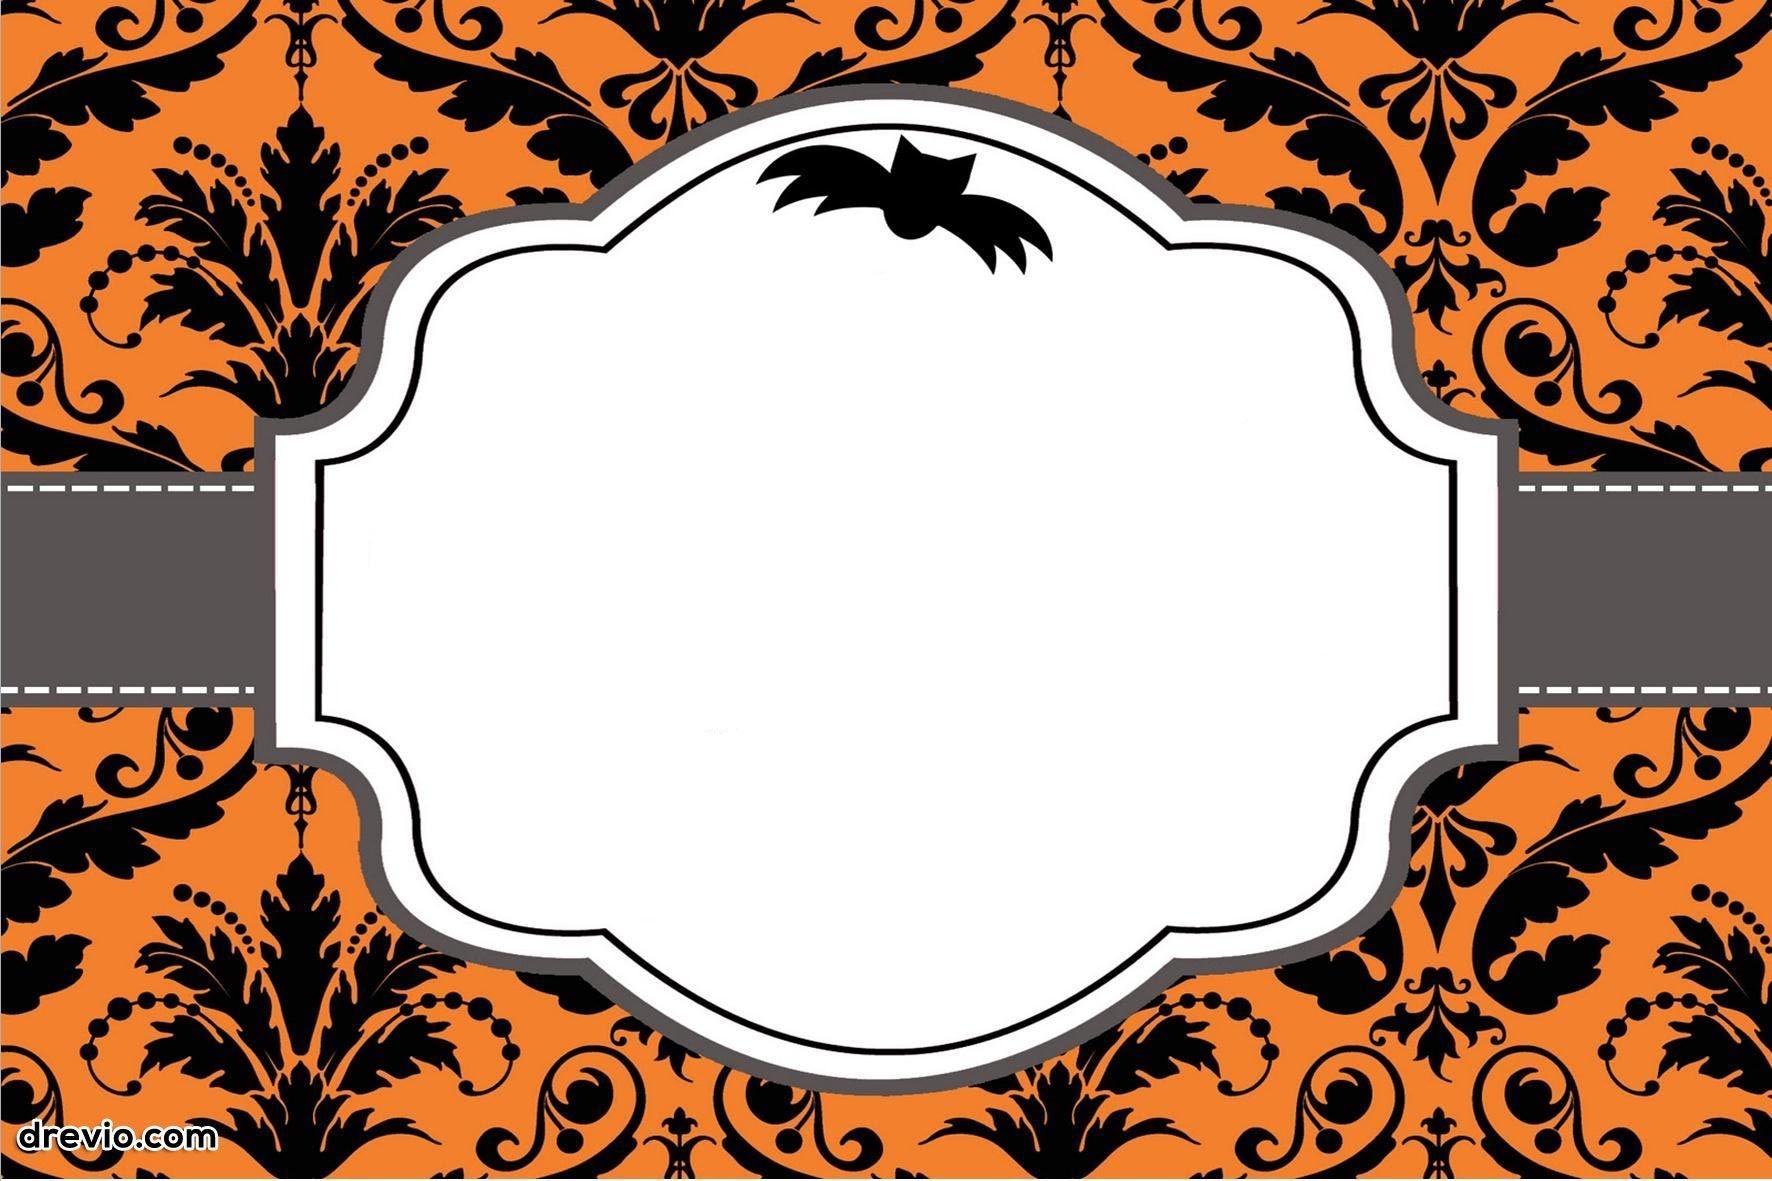 Free Printable Halloween Invitations   Free Printable Birthday - Halloween Party Invitation Templates Free Printable